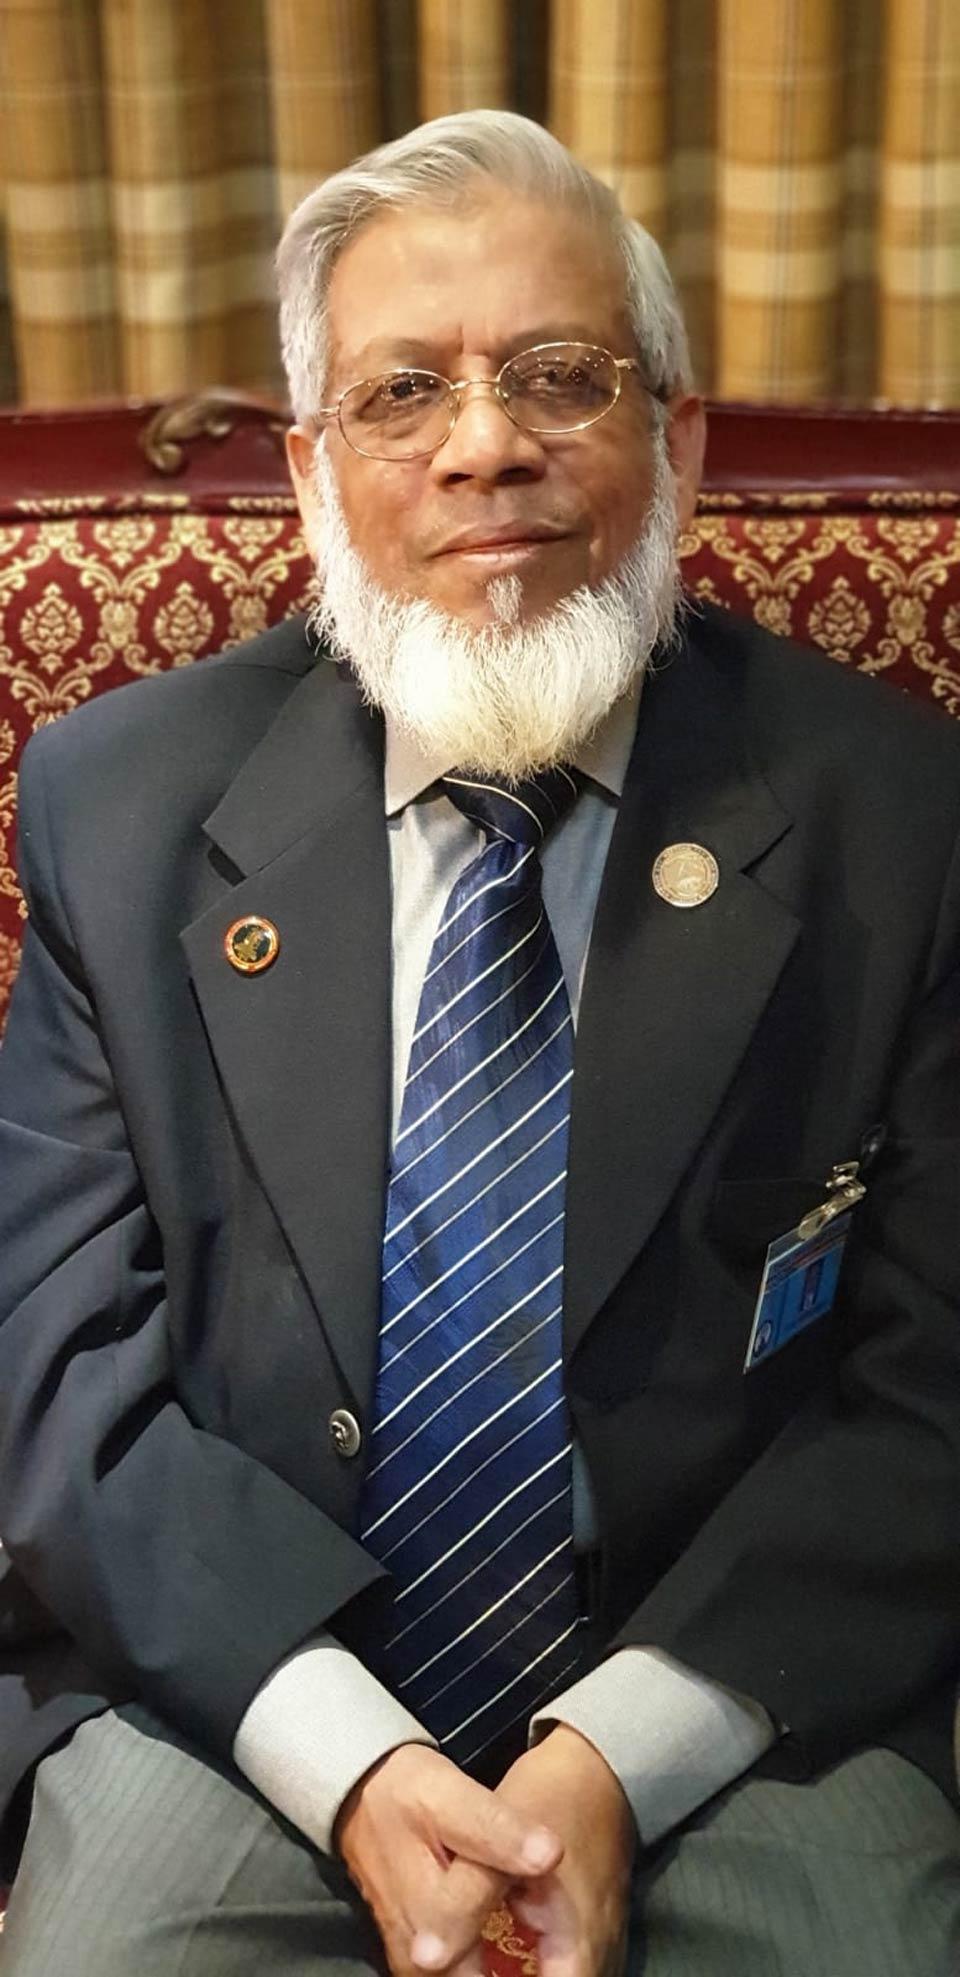 Engr. Iqbal Ahmed Khan, Vice President SAEEA